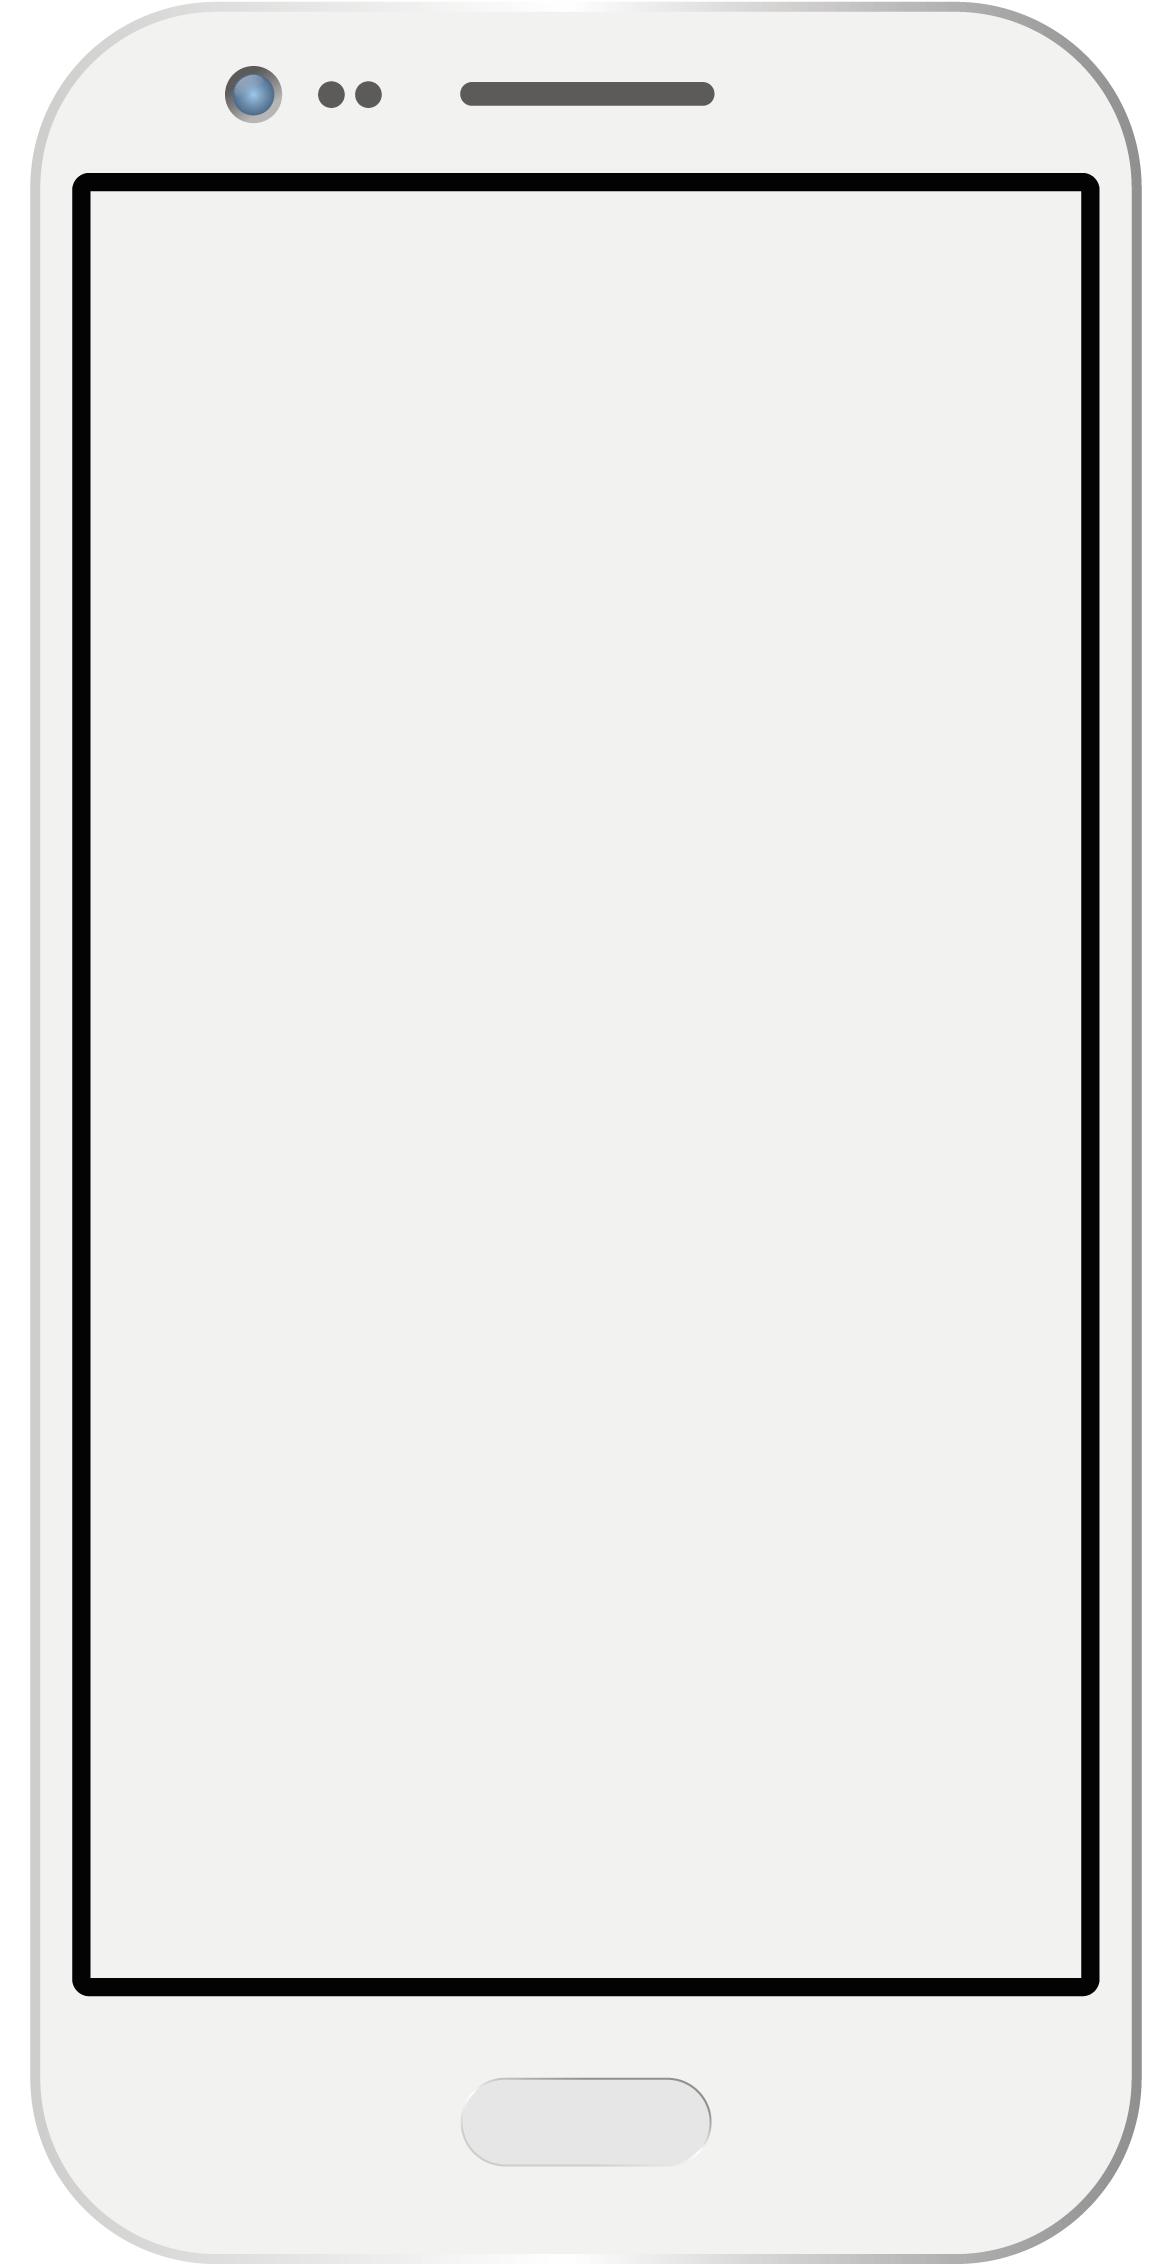 Mockup eines Handys